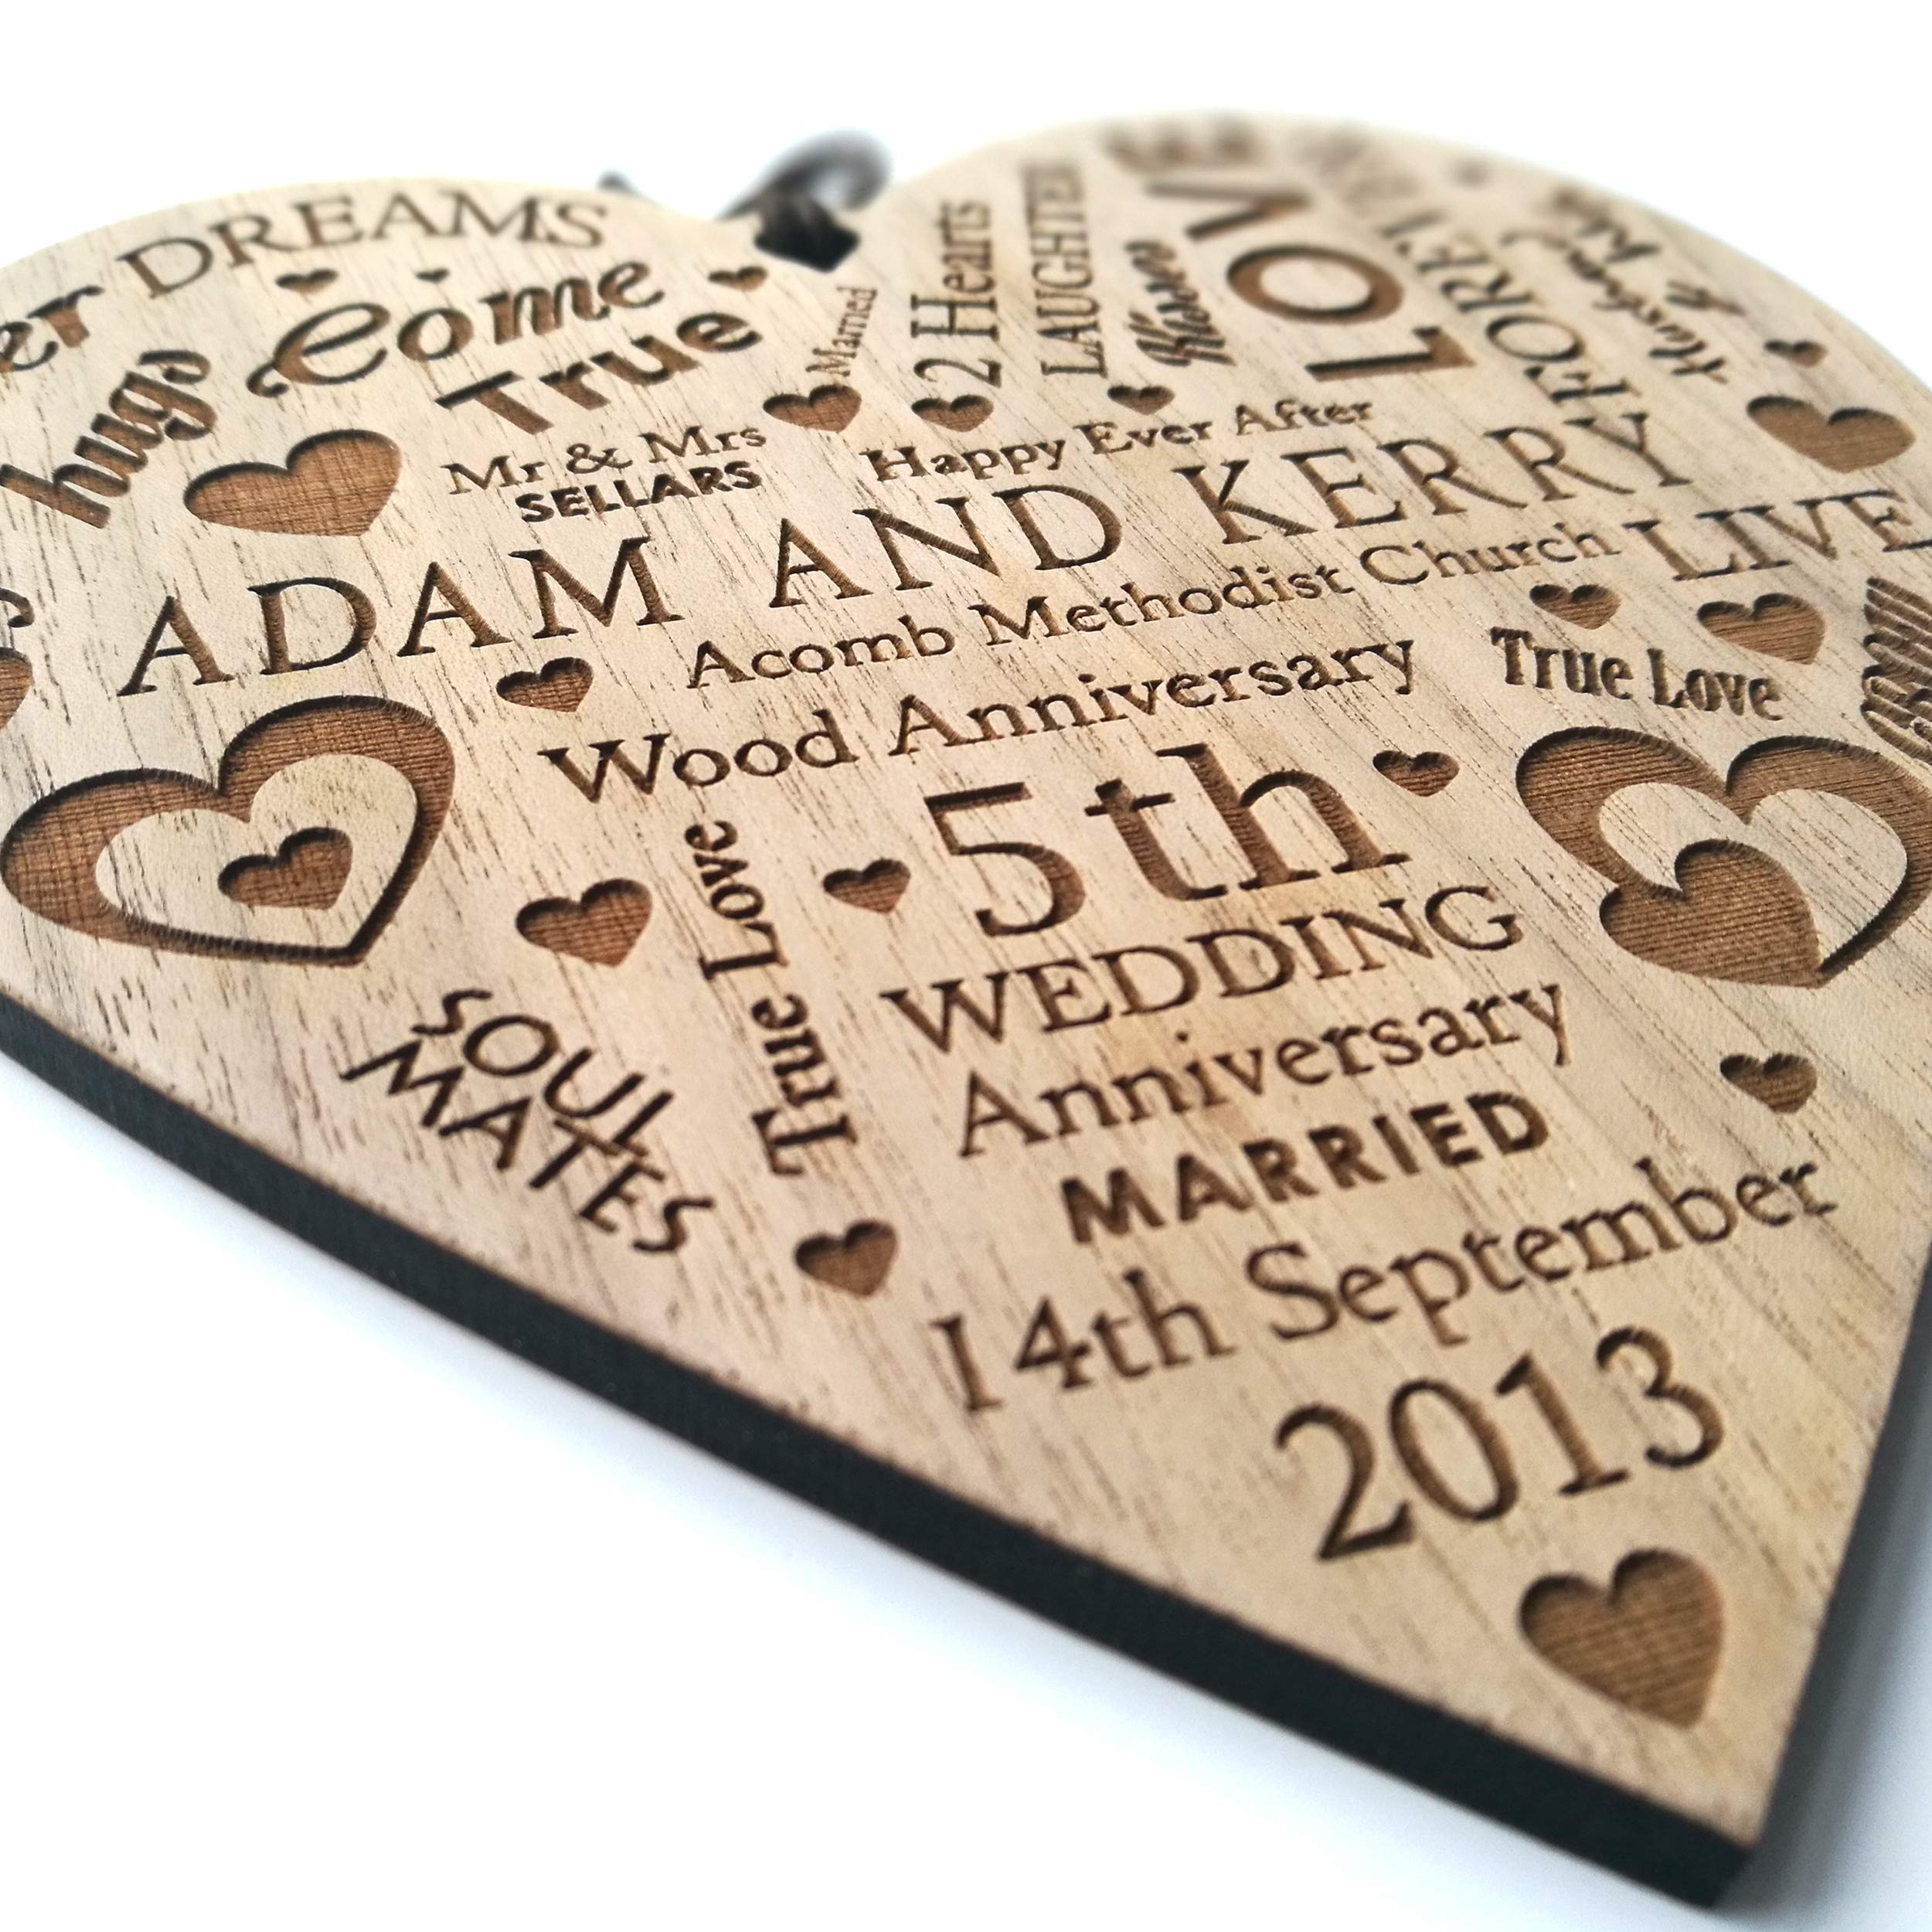 LoveThis** Wedding Anniversary Plaque Personalised Gift Marriage Anniversary Heart Present ~ Wooden Plaque  sc 1 st  Amazon UK & 15th Wedding Anniversary Gifts: Amazon.co.uk